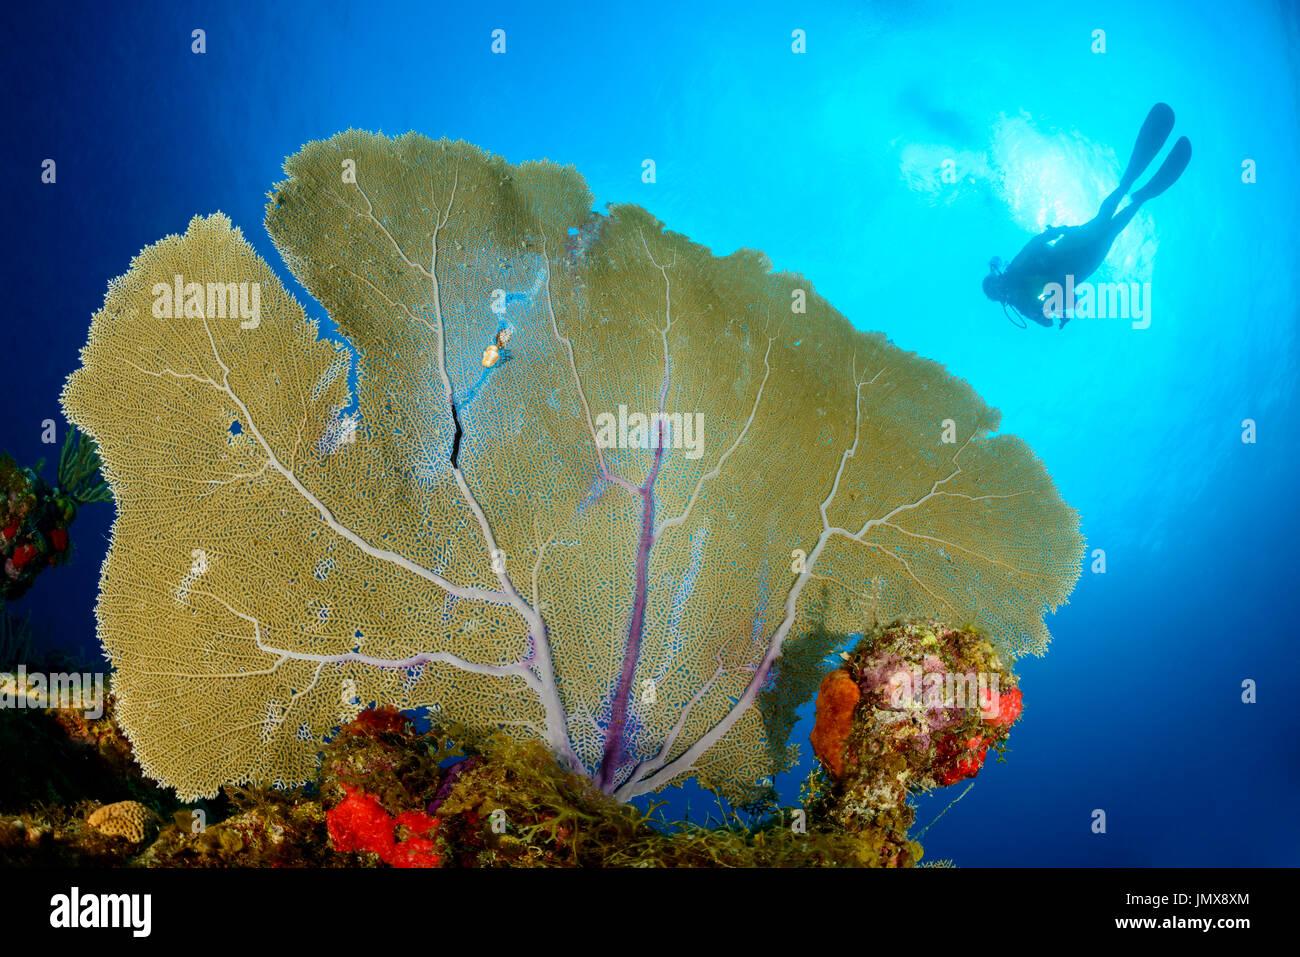 Gorgonia sp., Caribbean Coralreef and scuba diver with Gorgonia, Cooper Island, British Virgin Islands, Caribbean Stock Photo